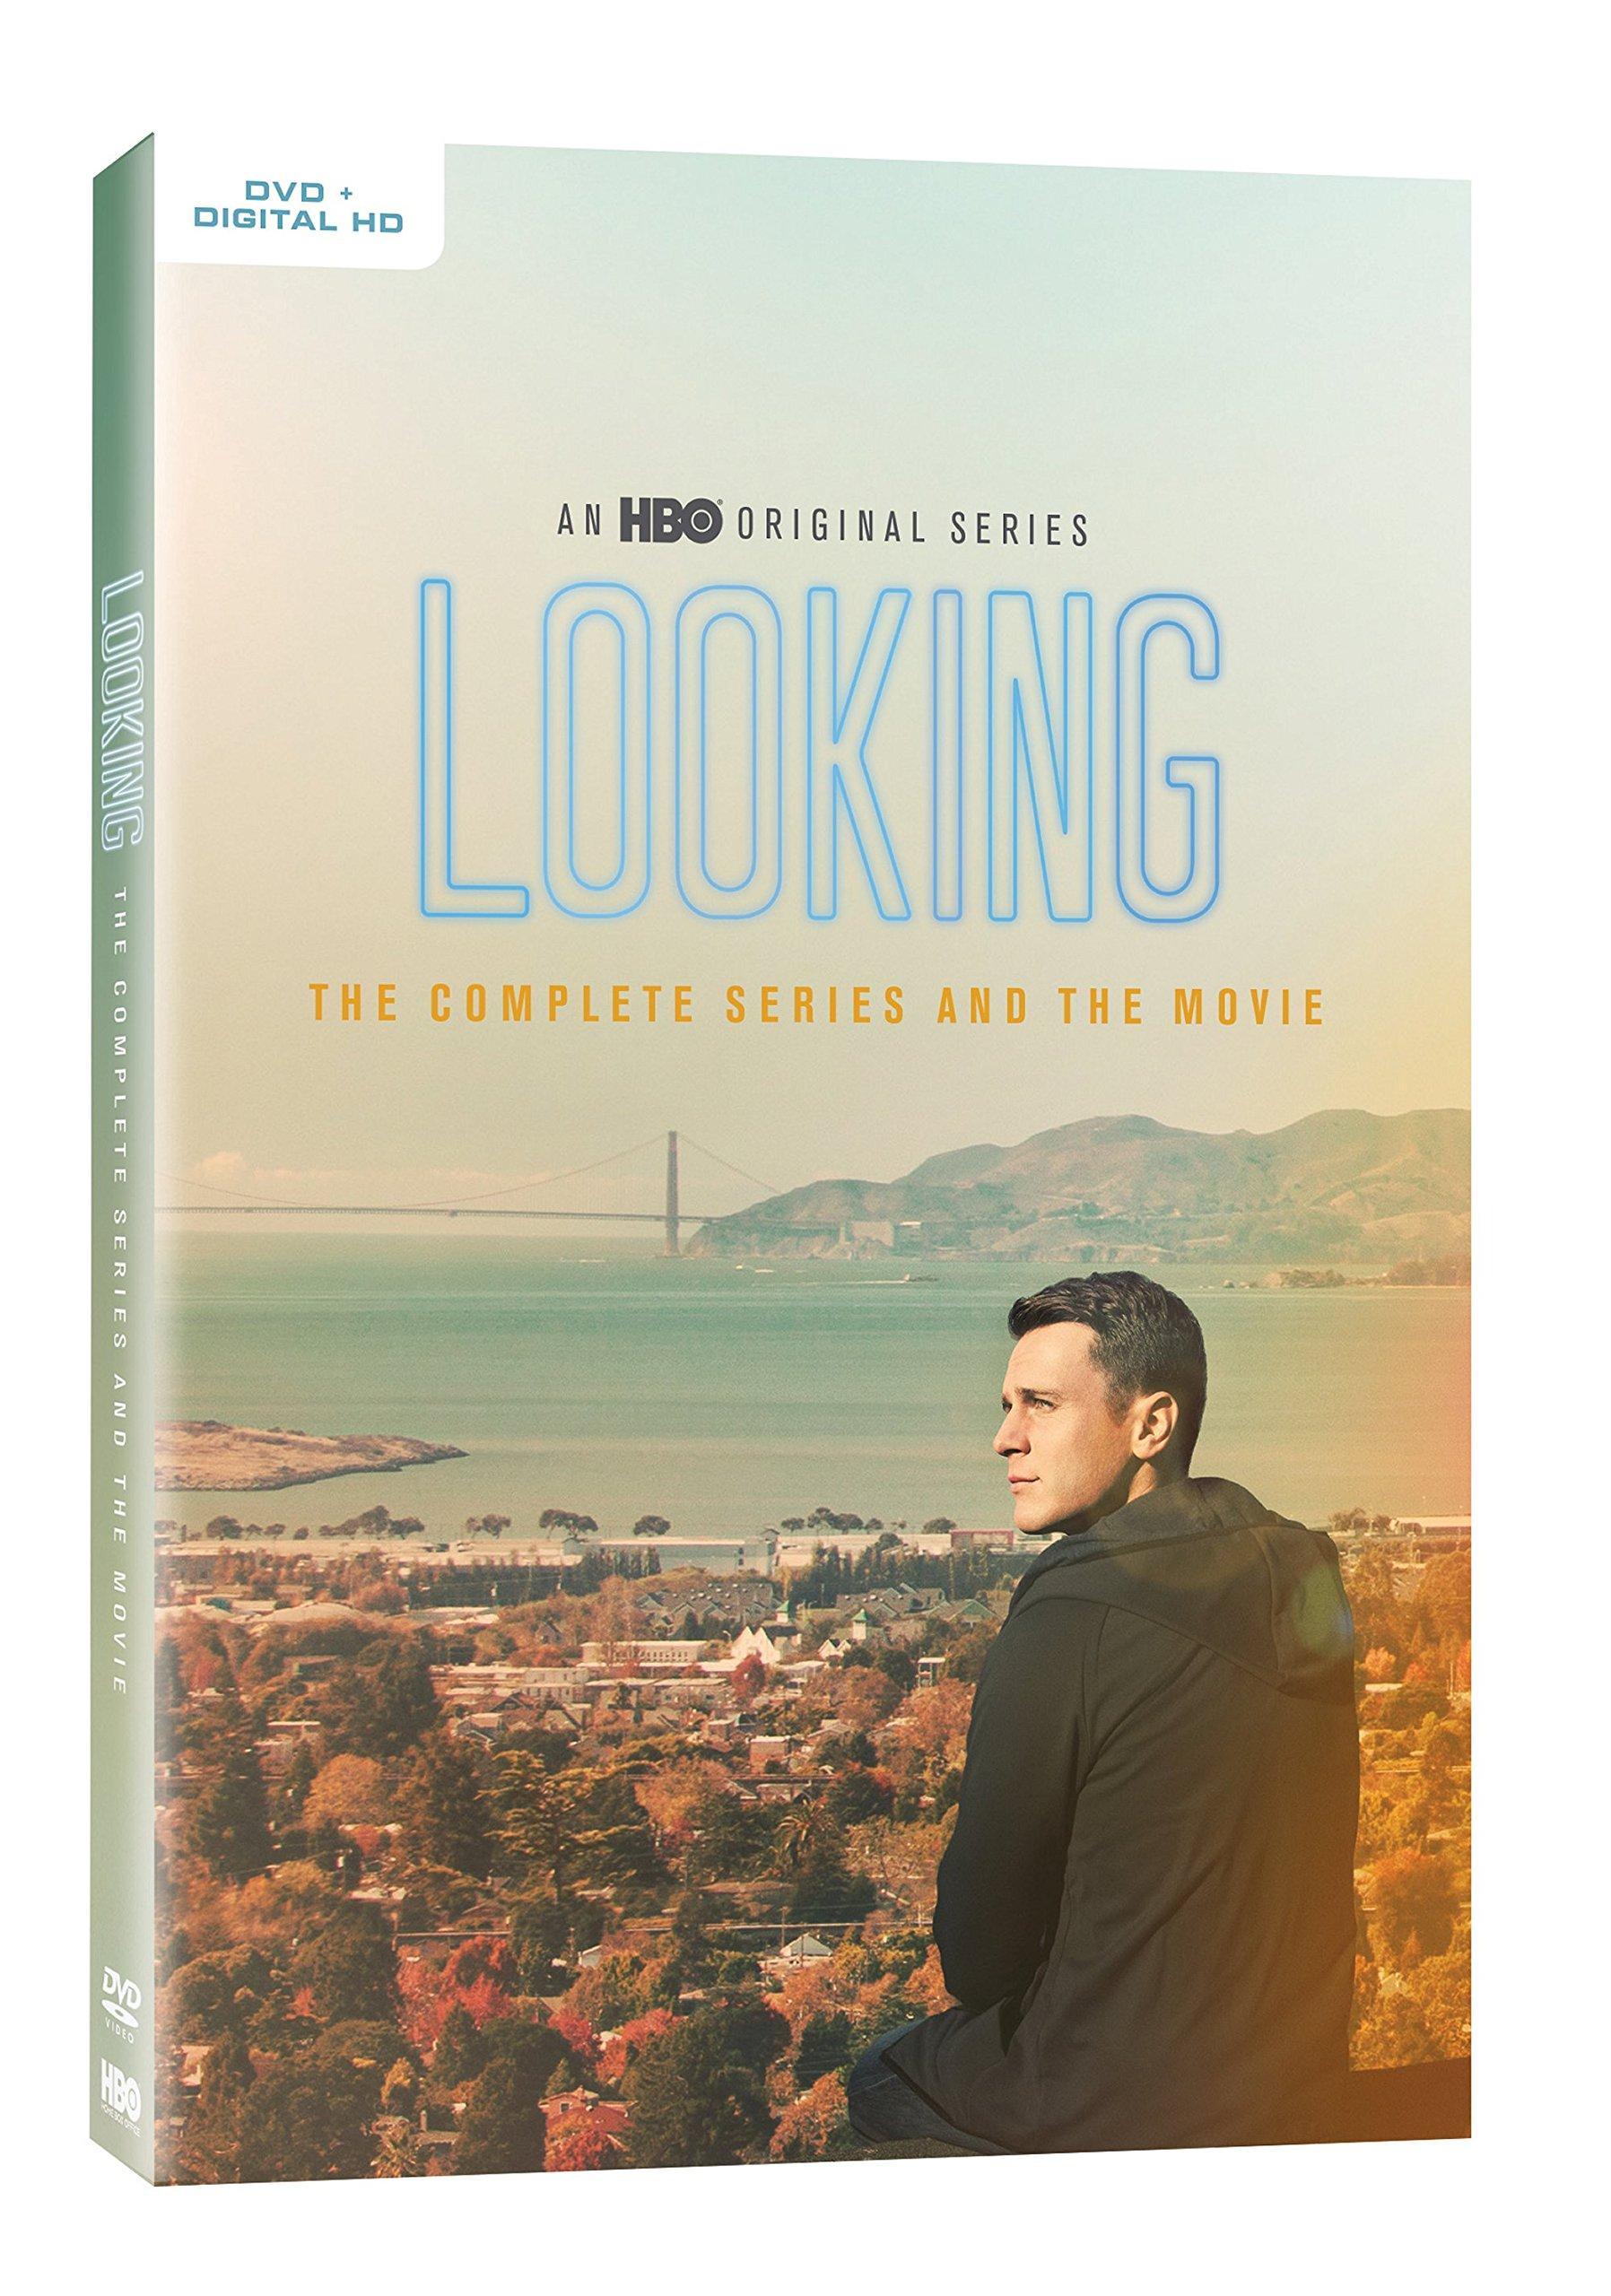 DVD : Looking: The Complete Series & Movie (Ultraviolet Digital Copy, Full Frame, Slipsleeve Packaging, 2 Pack, Digital Theater System)